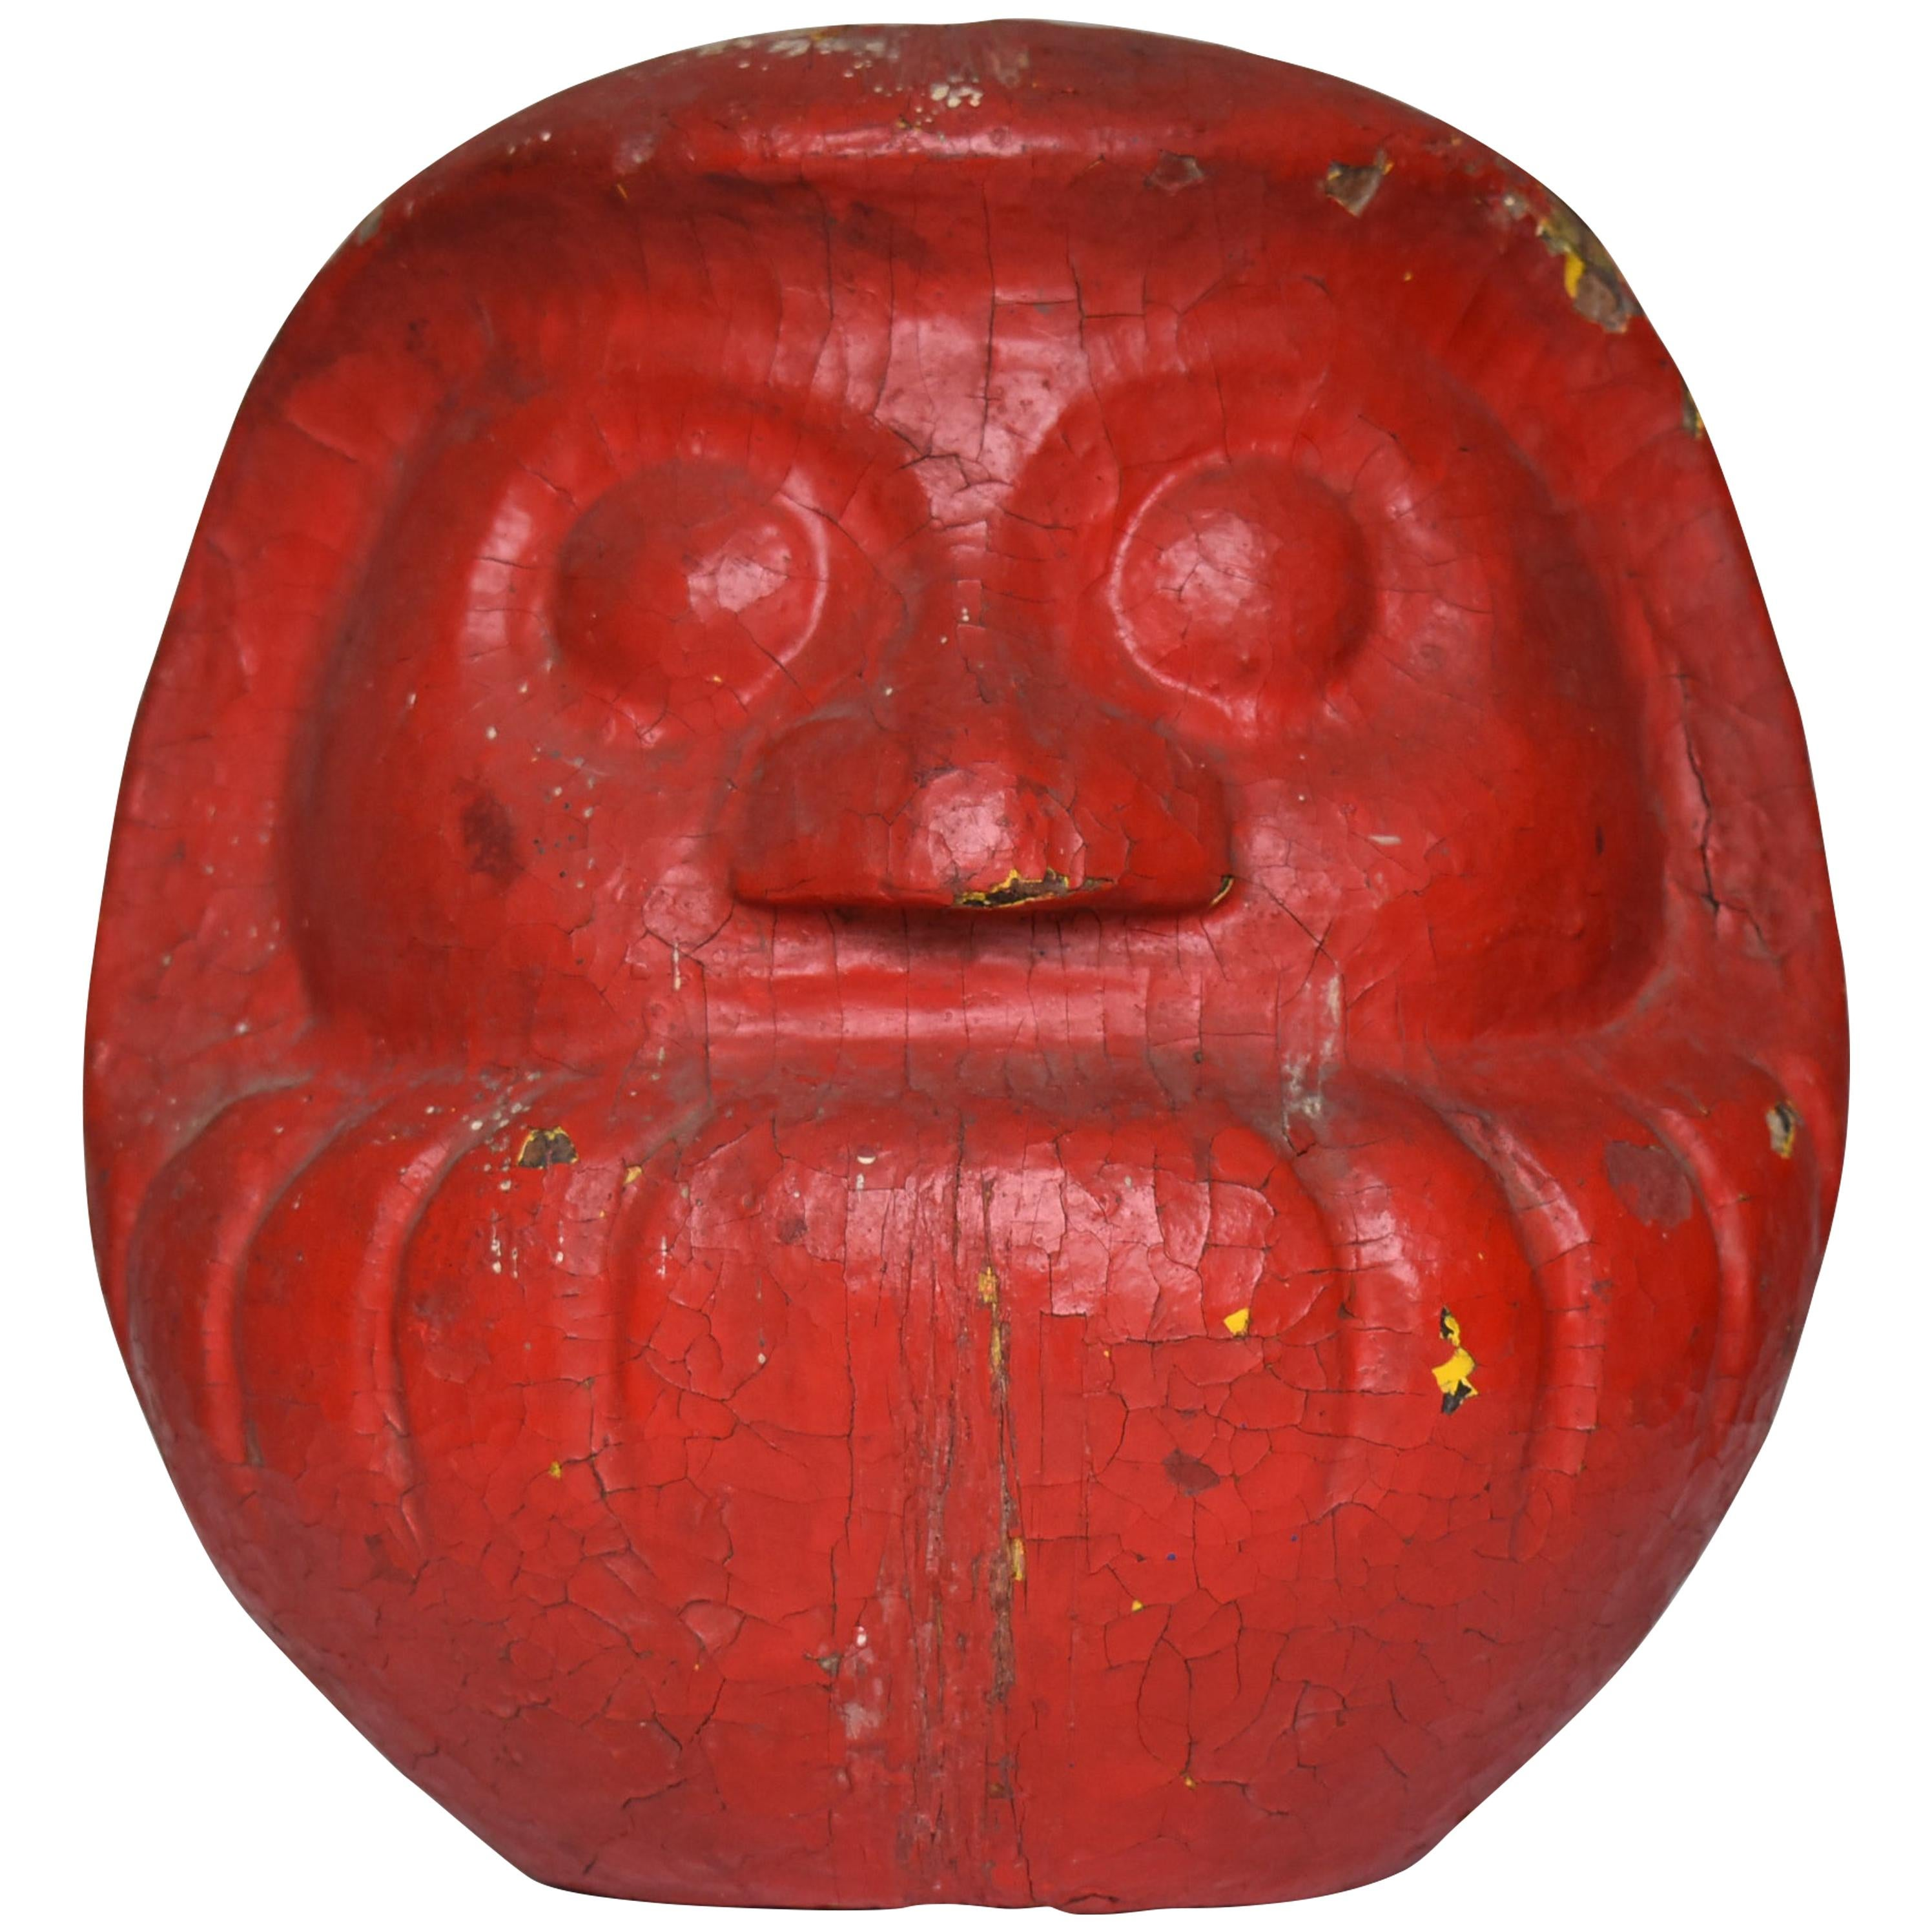 Japanese Folk Art Old Pottery Daruma 1920s-1940s / Contemporary Art Figurine